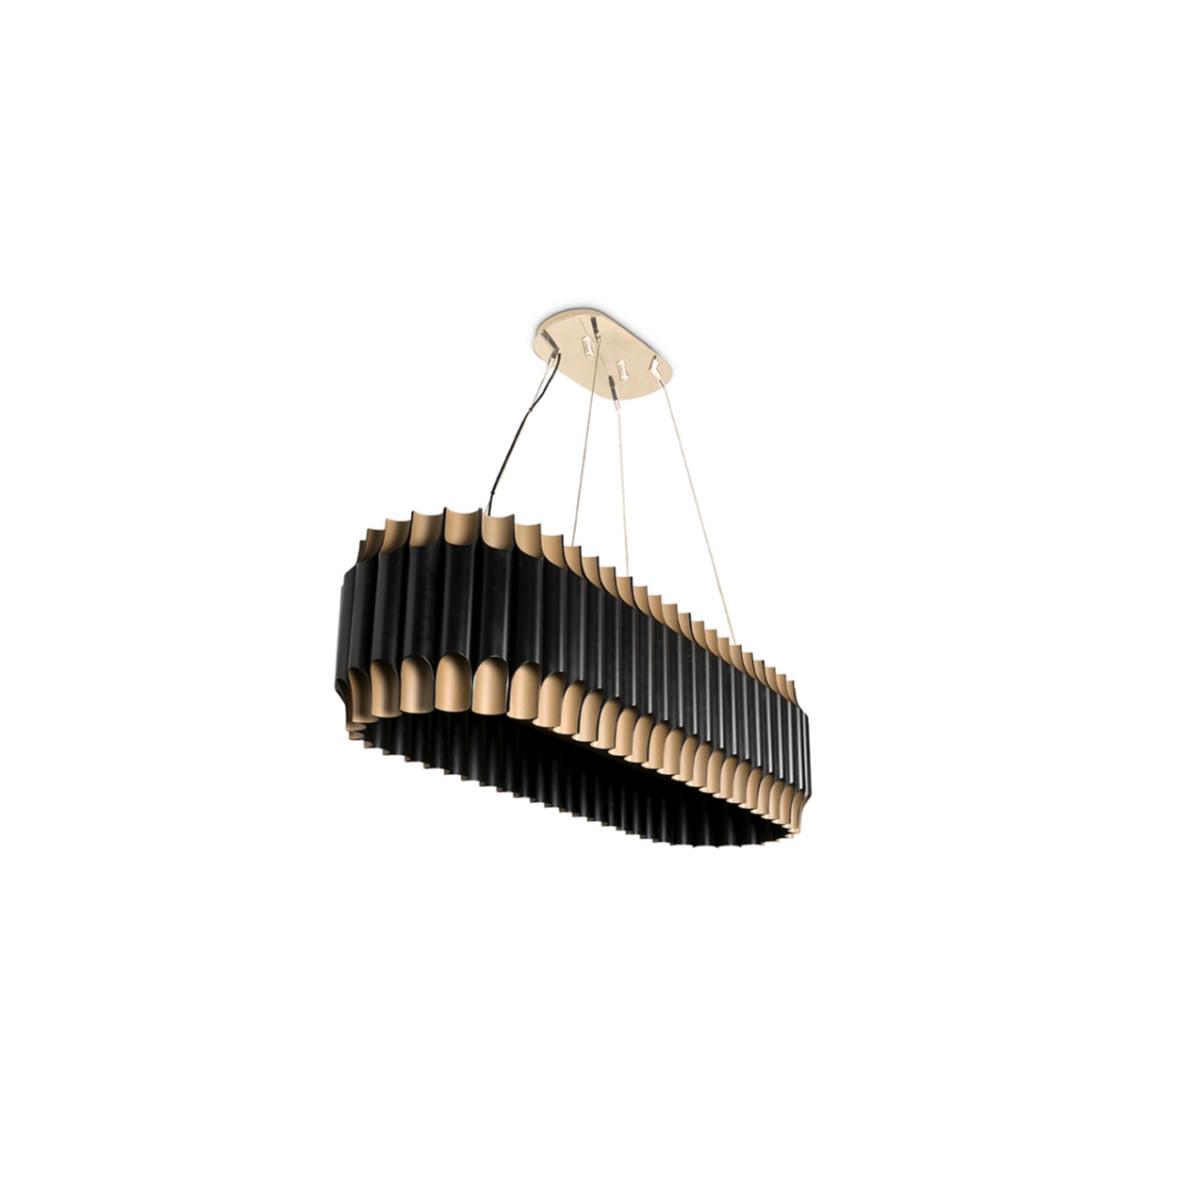 GALLIANO SNOOKER SUSPENSION LAMP DELIGHTFULL